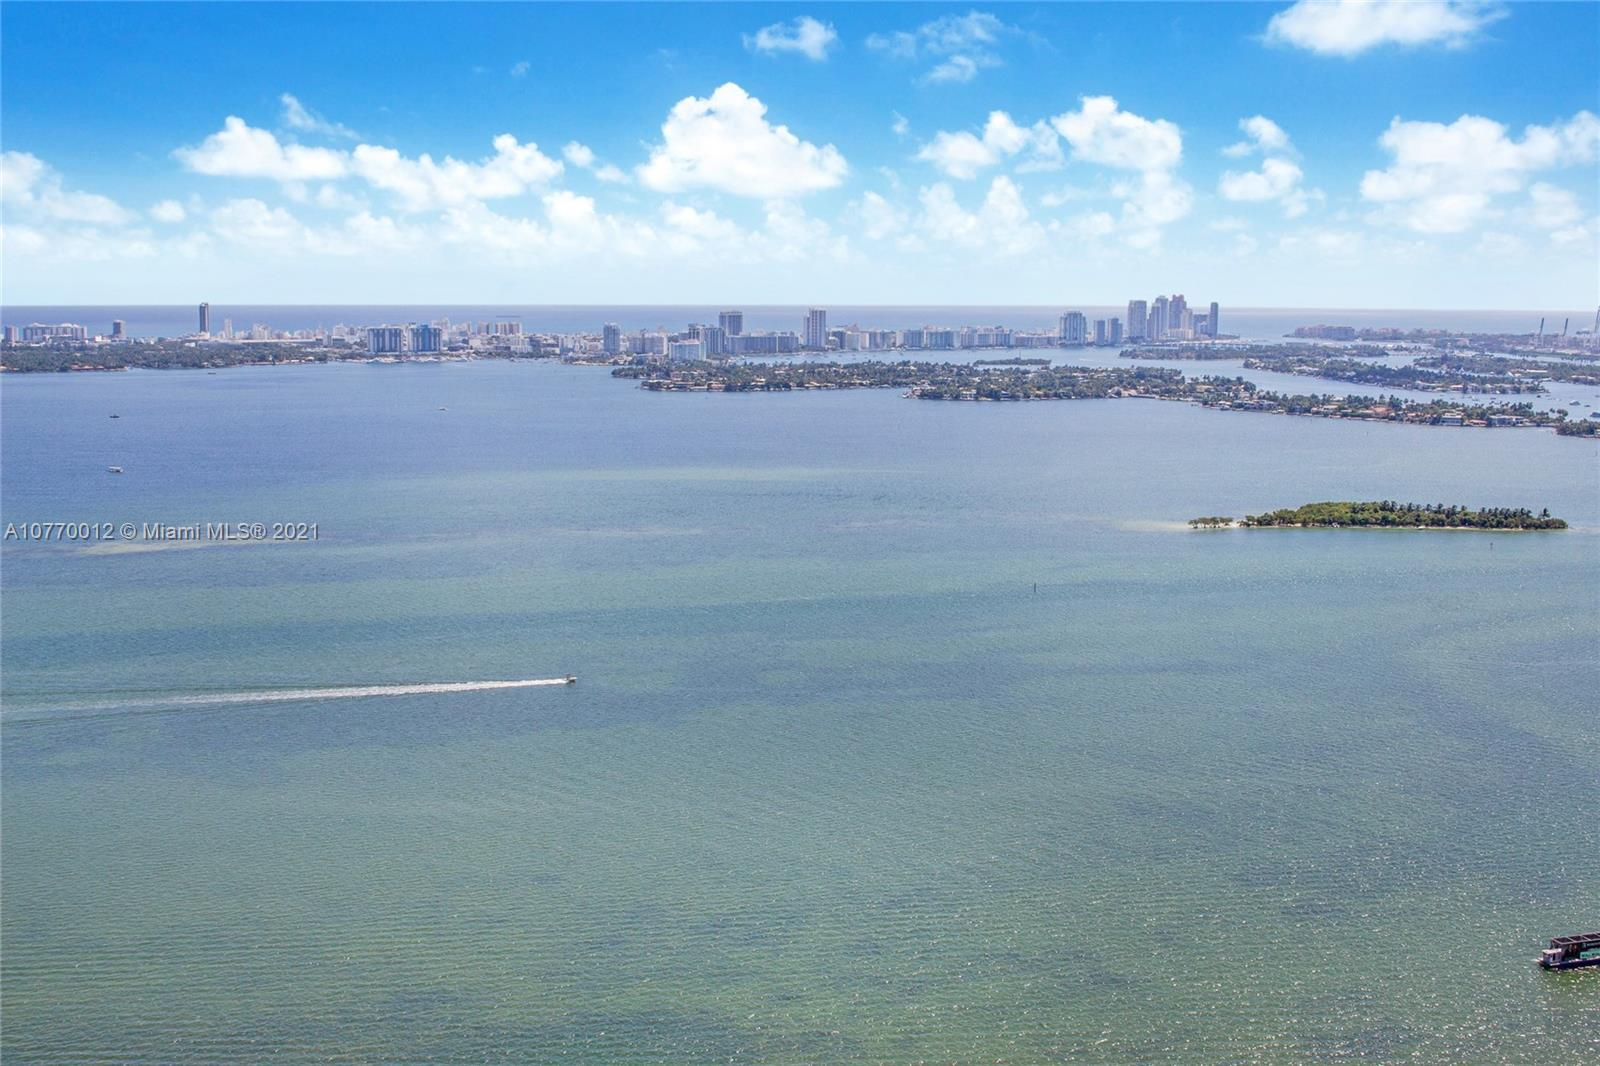 NE corner Penthouse: 4/4.5 + Den; 3182 SF; panoramic bay views. The staged photos create  a contempo